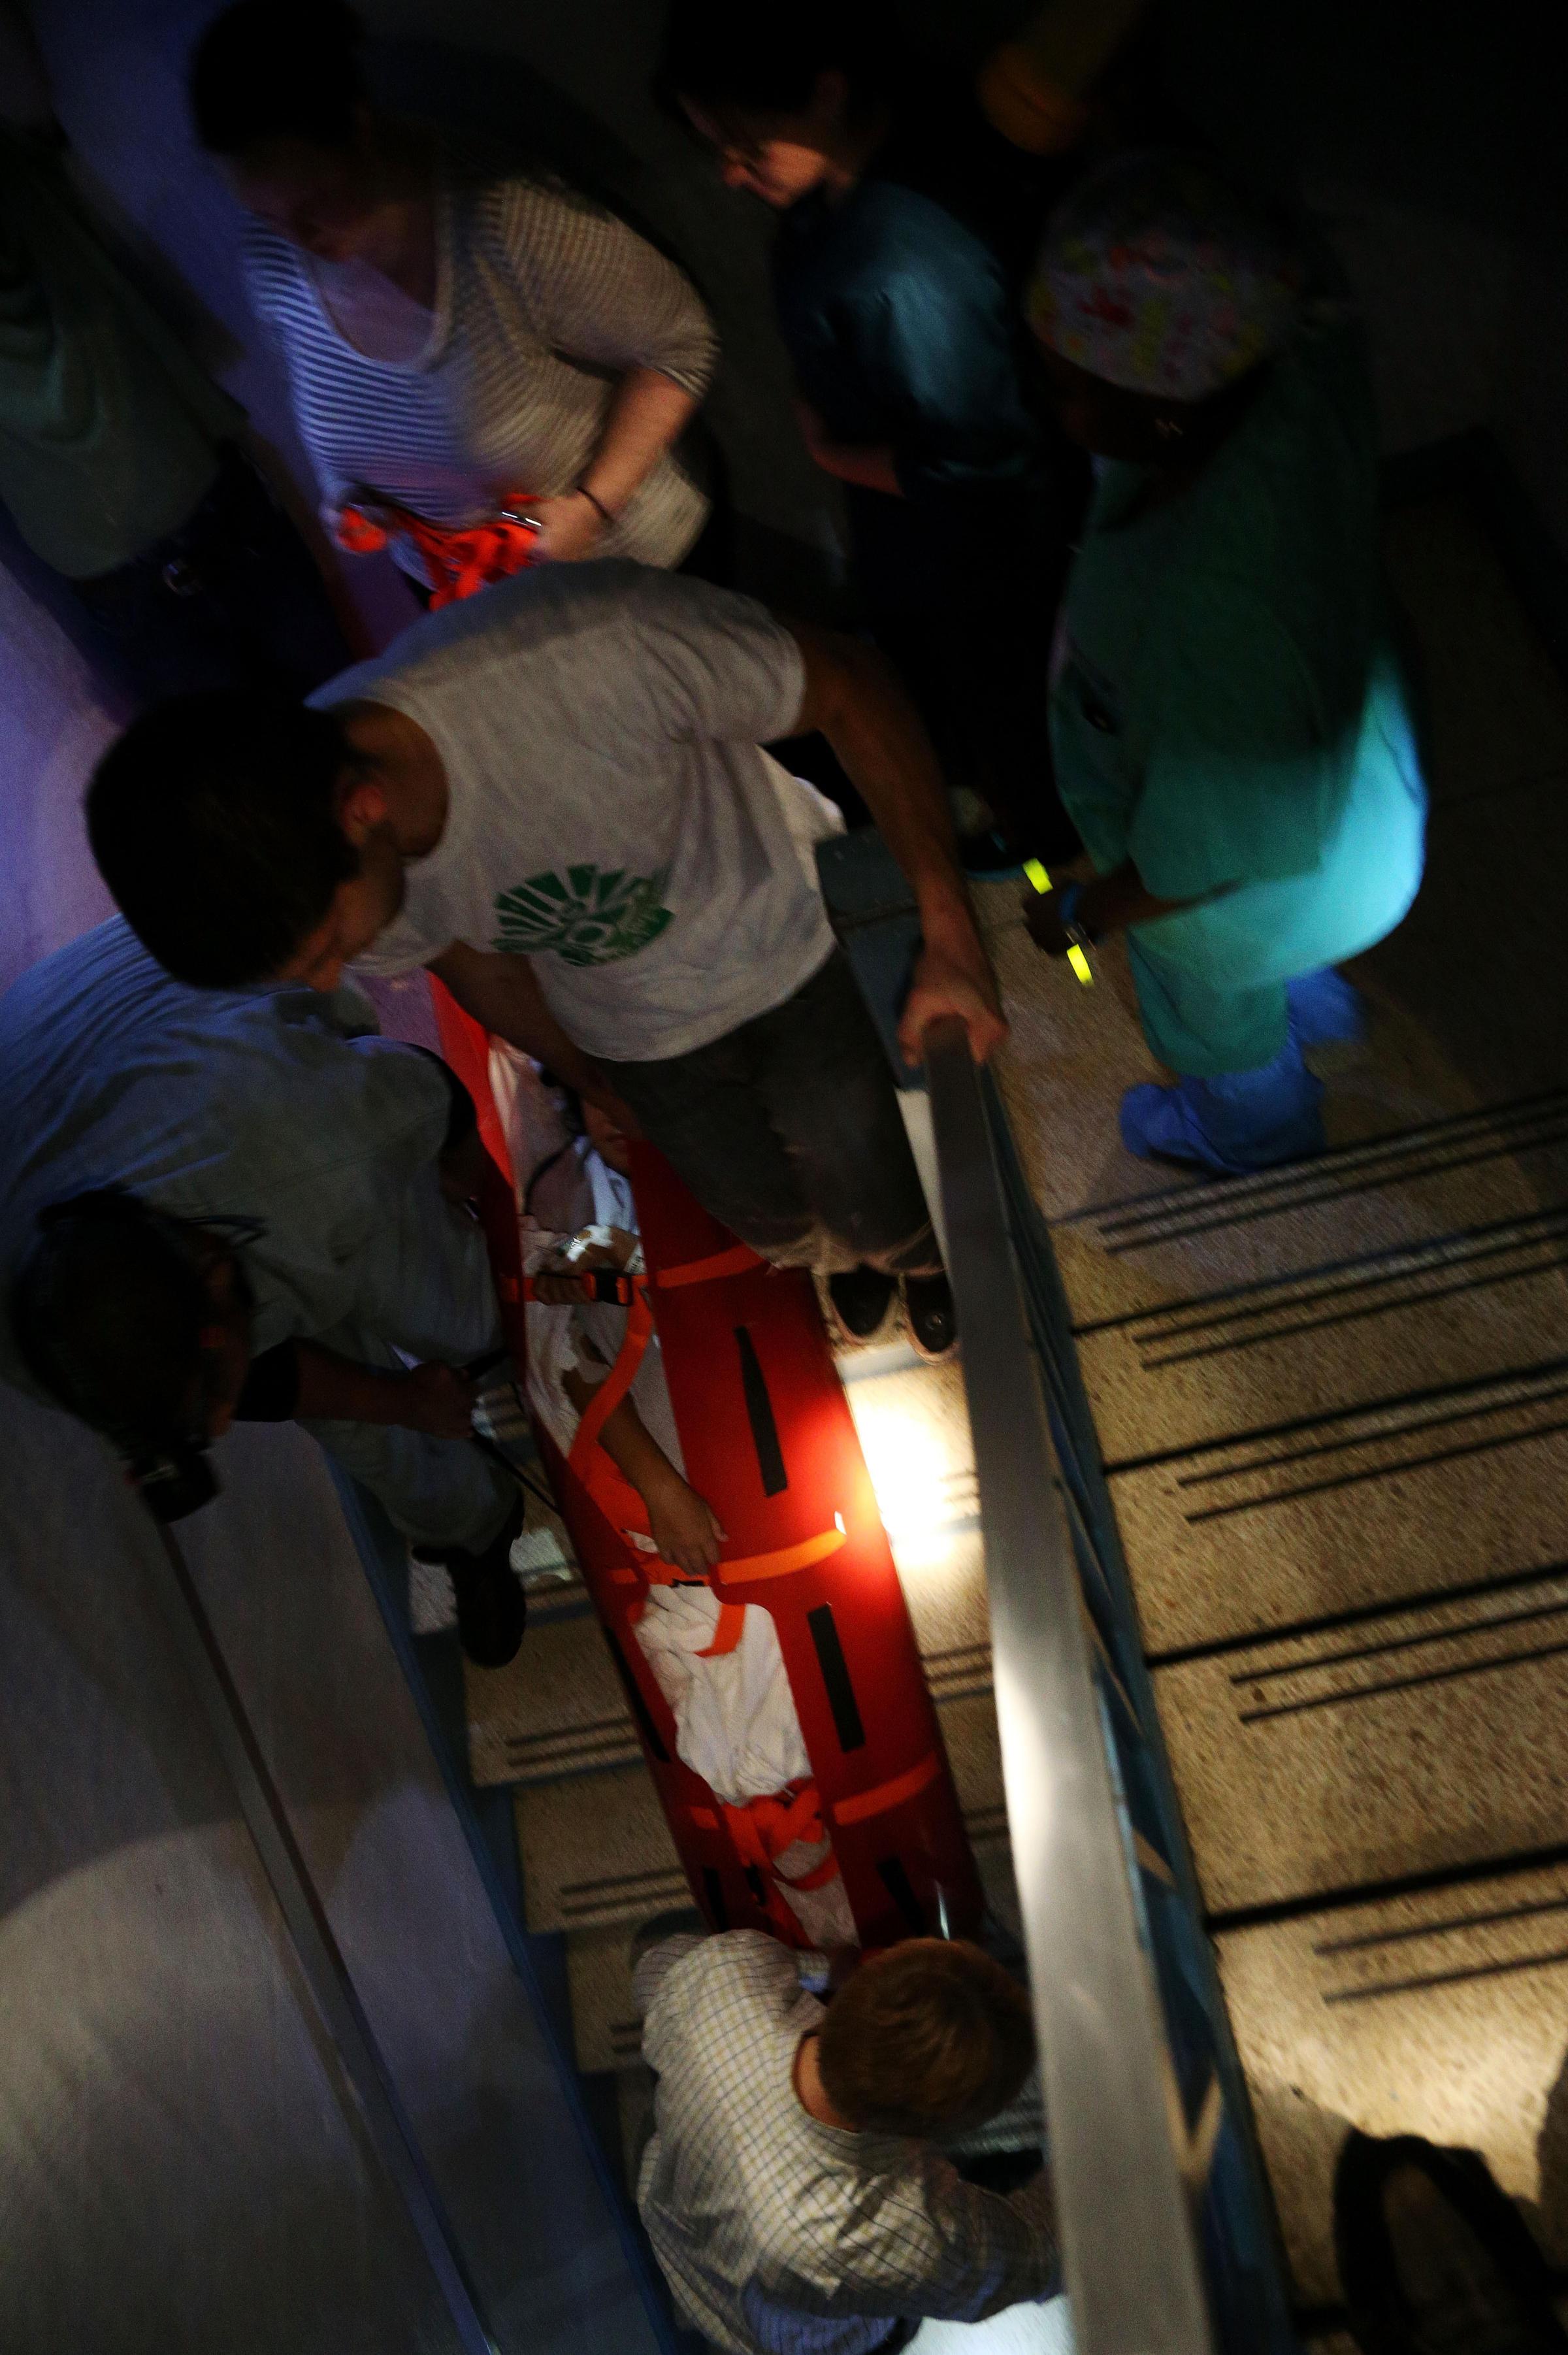 At New York University Medical Center, A Dramatic, Critical